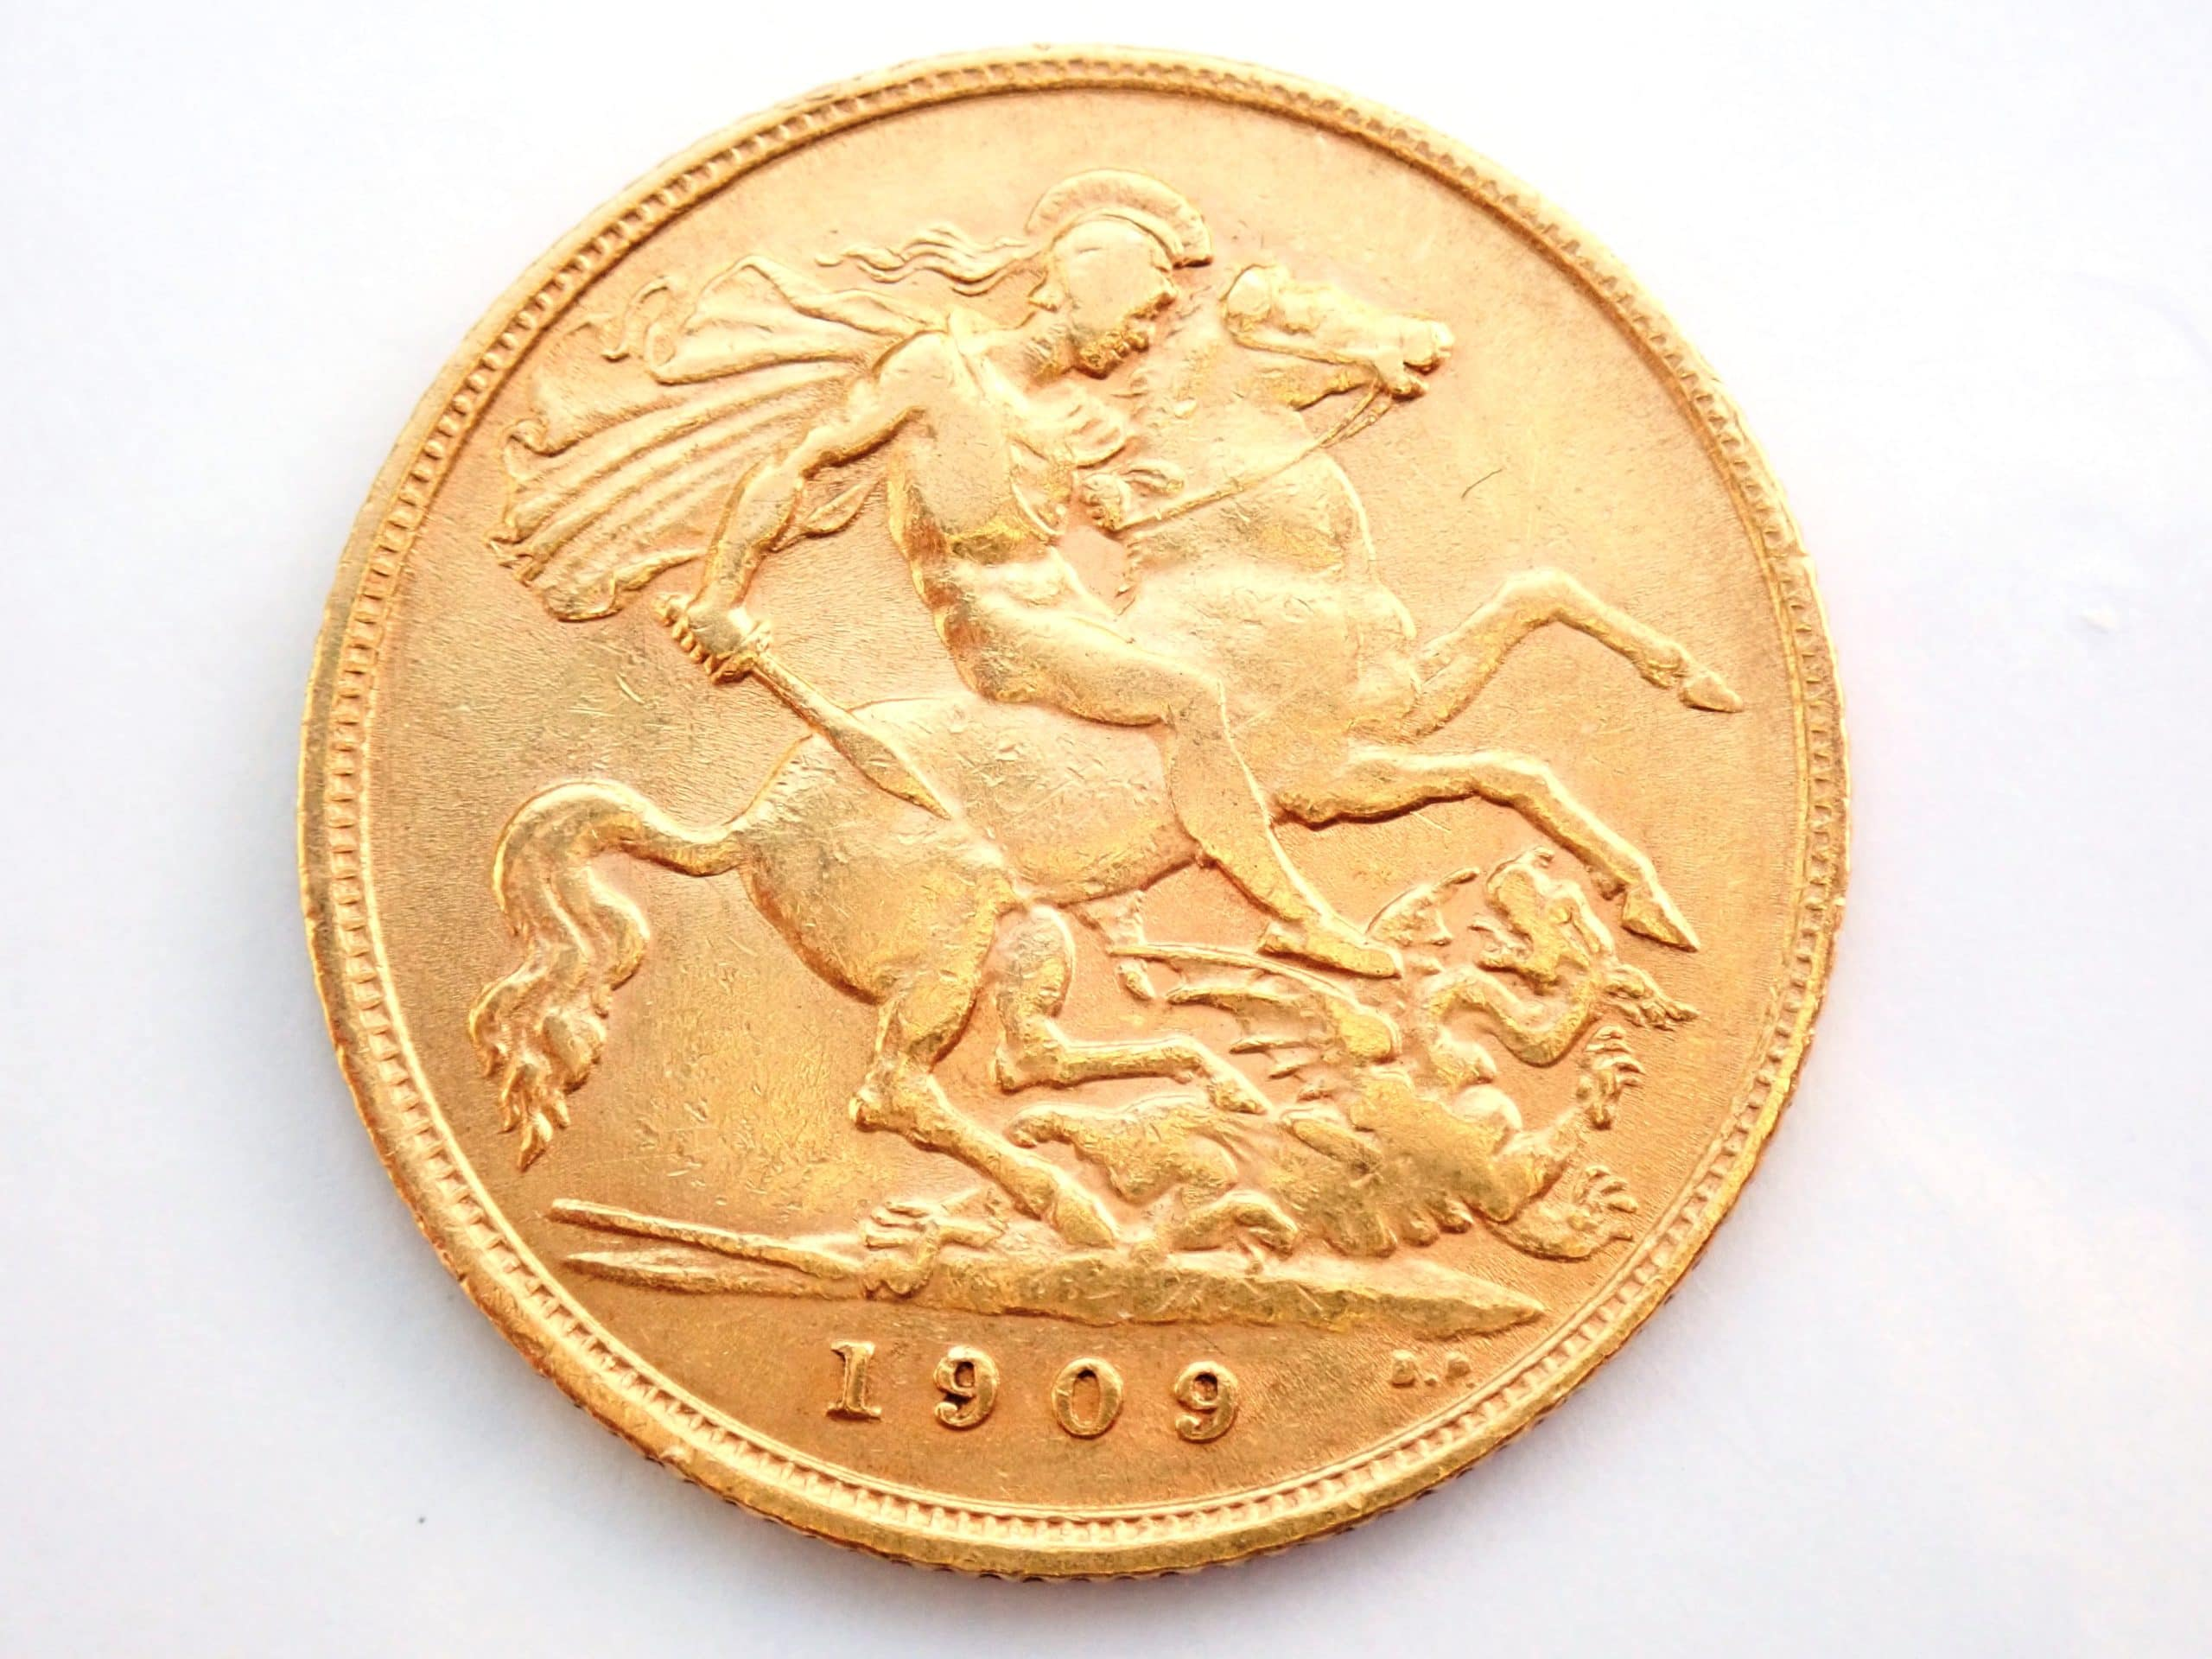 1909 22ct Gold Half Sovereign King Edward VII Coin London Mint A.U #195